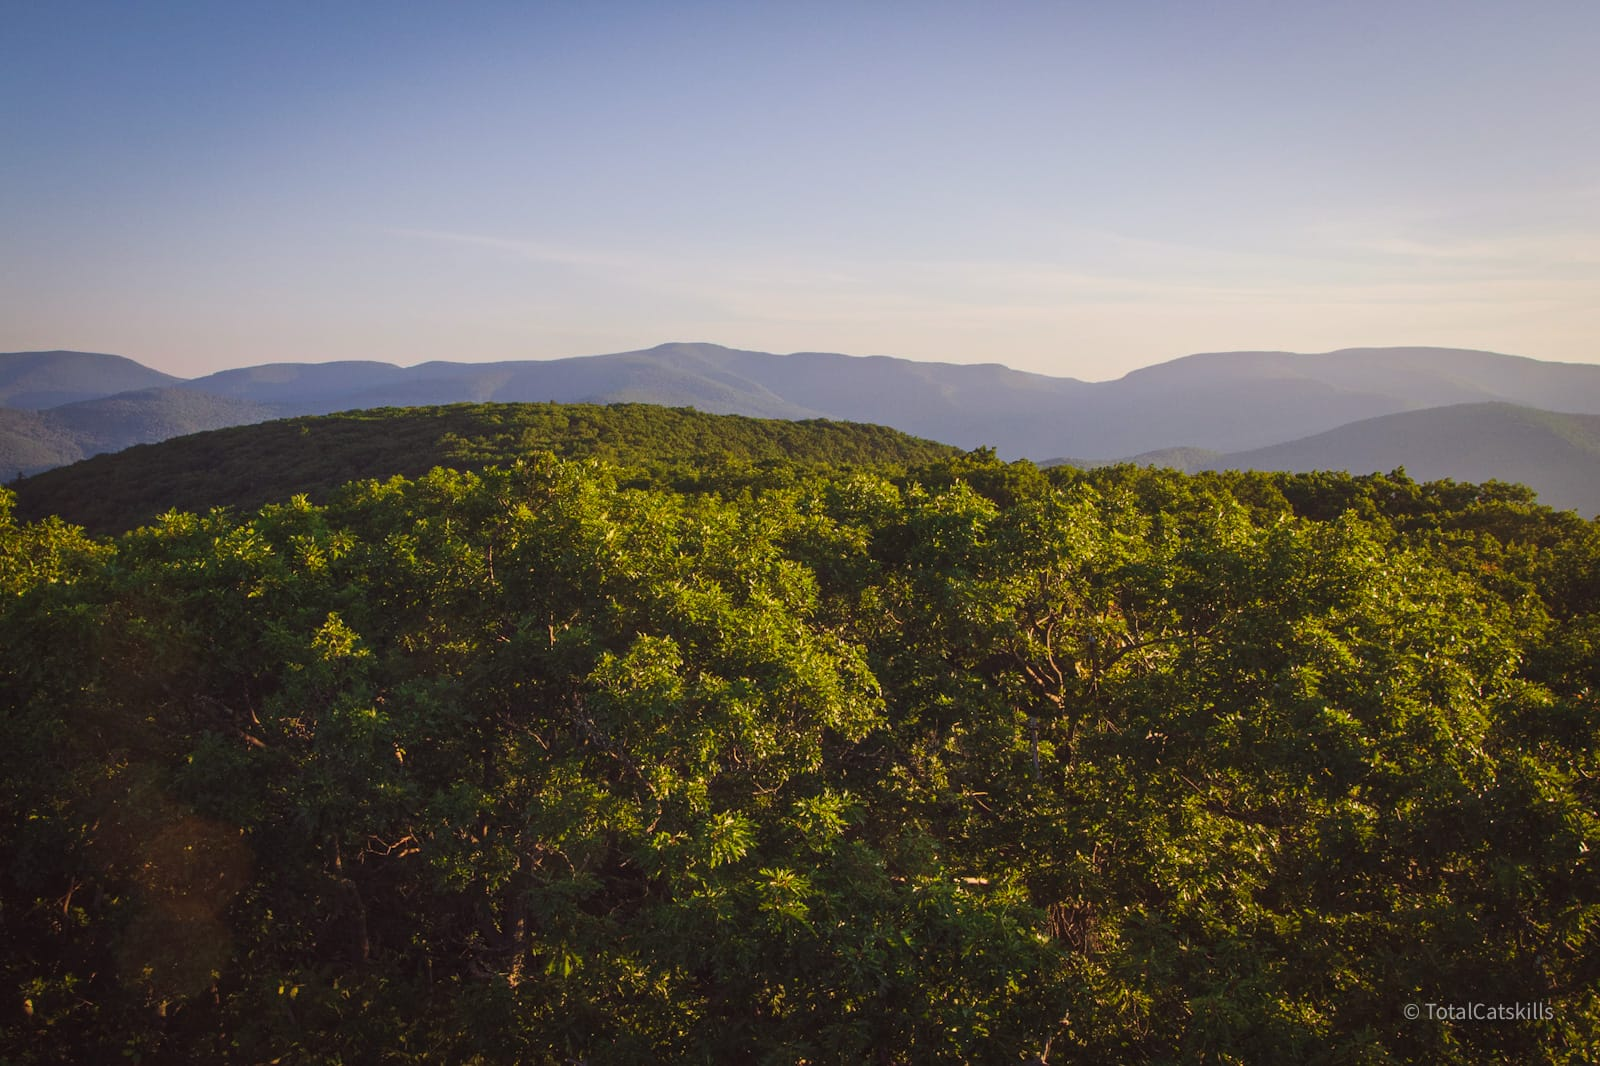 mountain ridges in distance